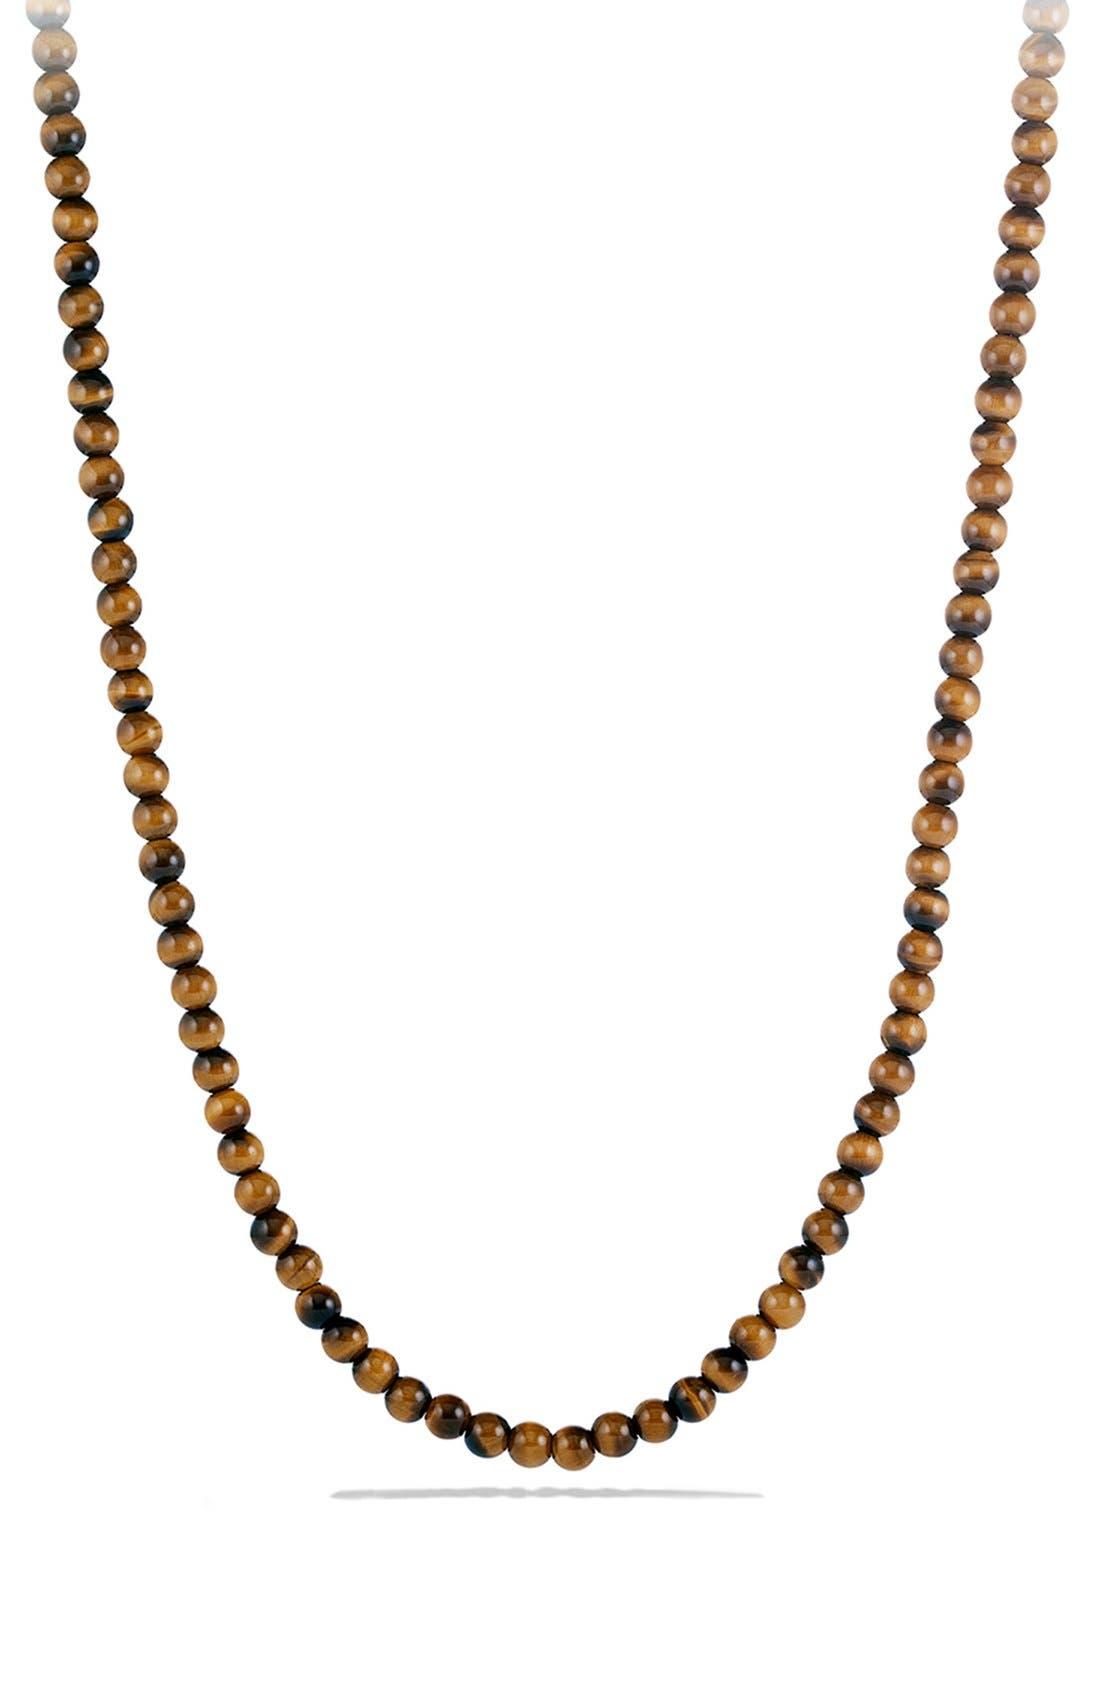 Alternate Image 1 Selected - David Yurman 'Spiritual Beads' Necklace with Stone